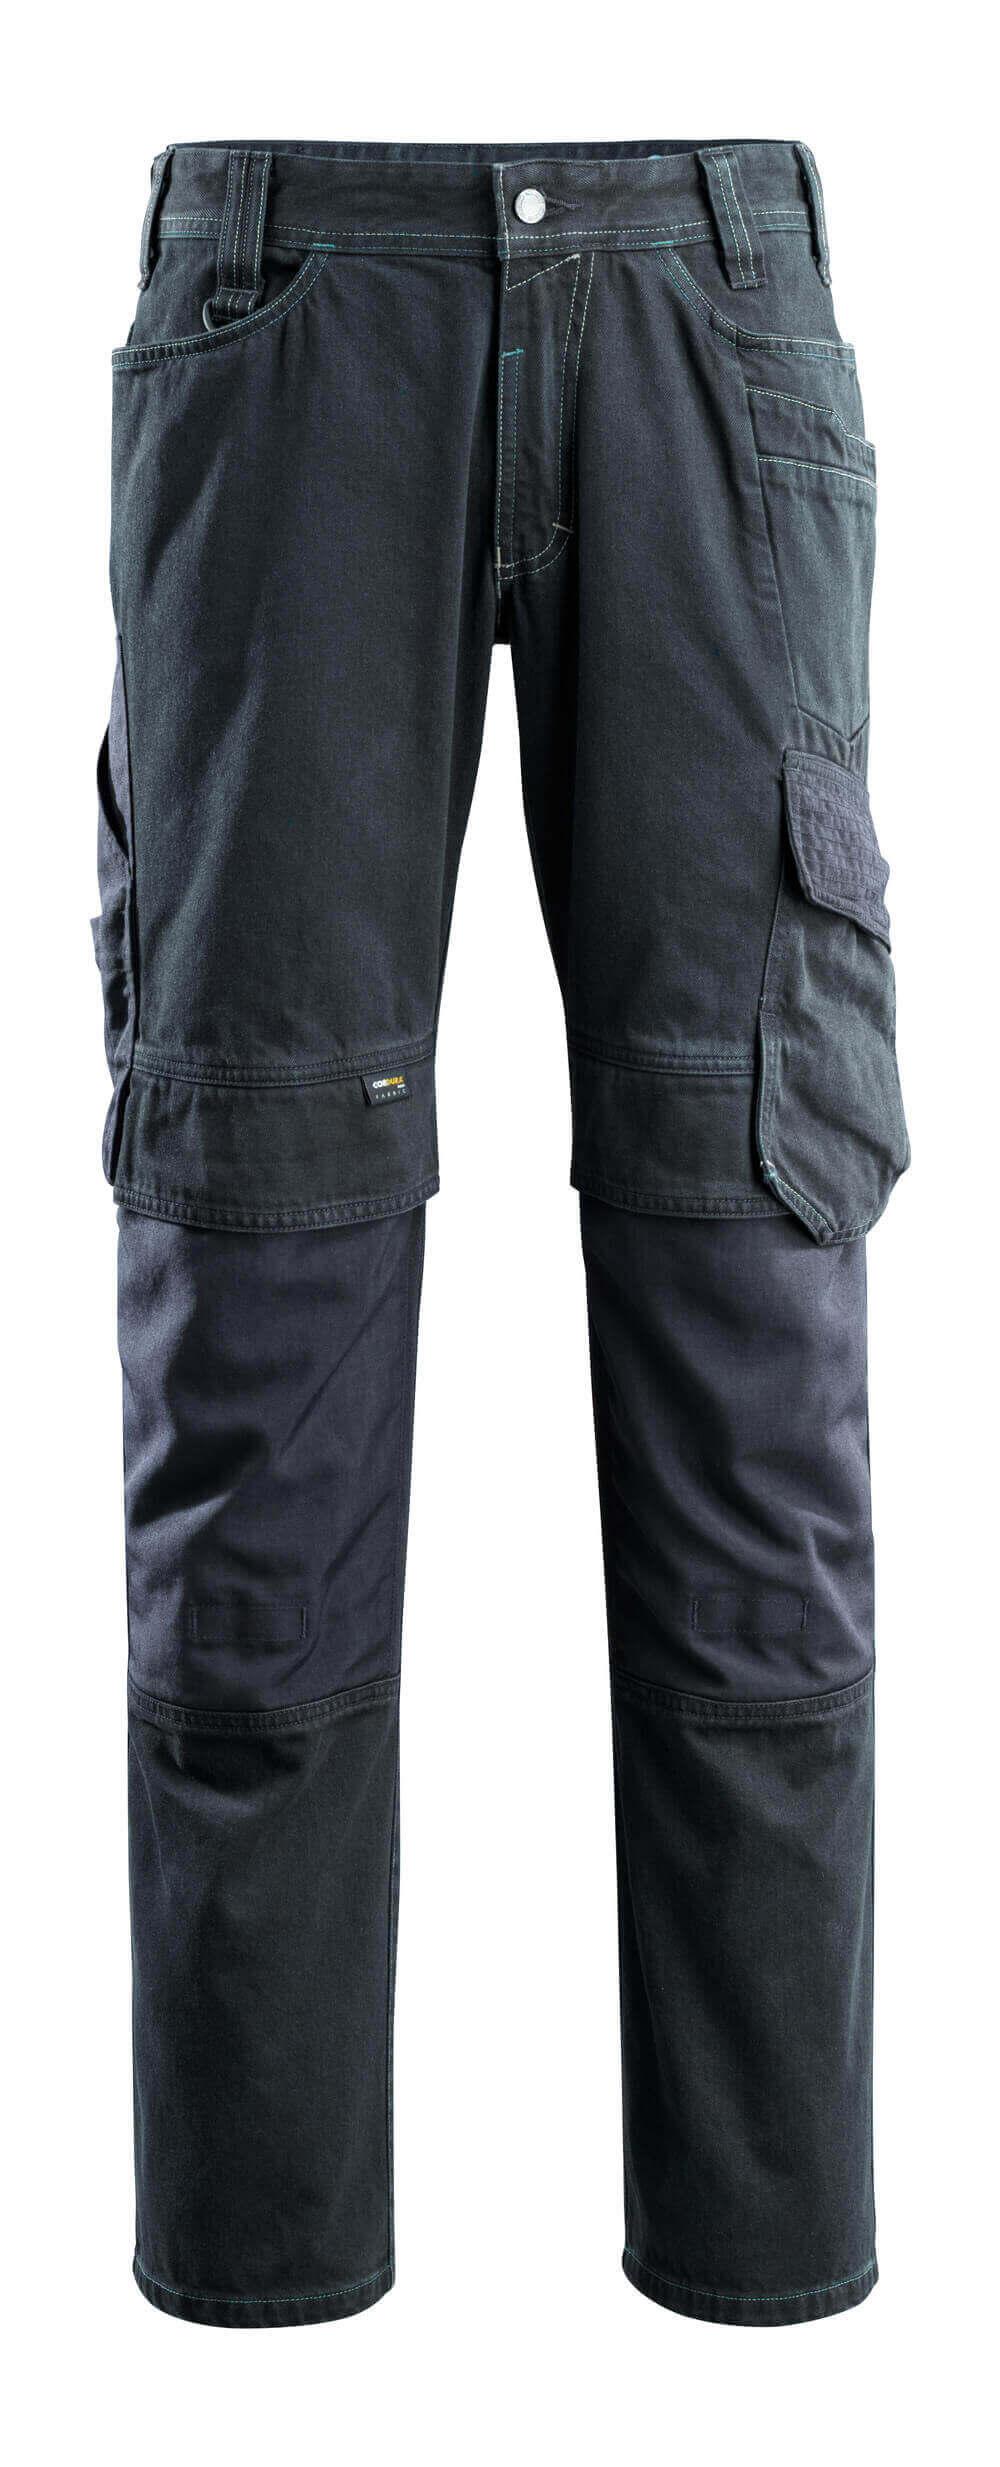 15179-207-86 Jeans med knäfickor - mörk blå denim